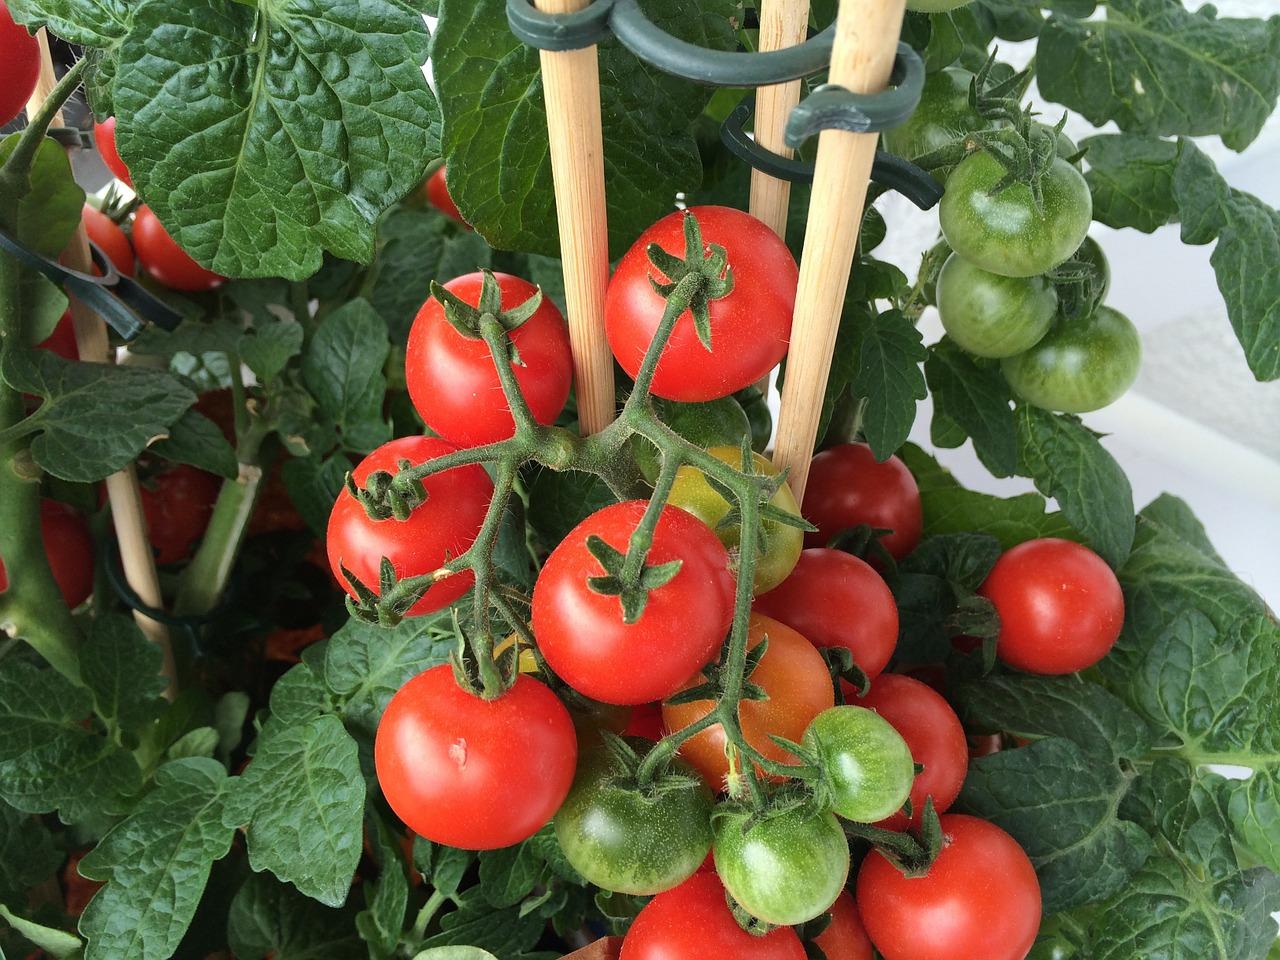 The mature cherry tomato